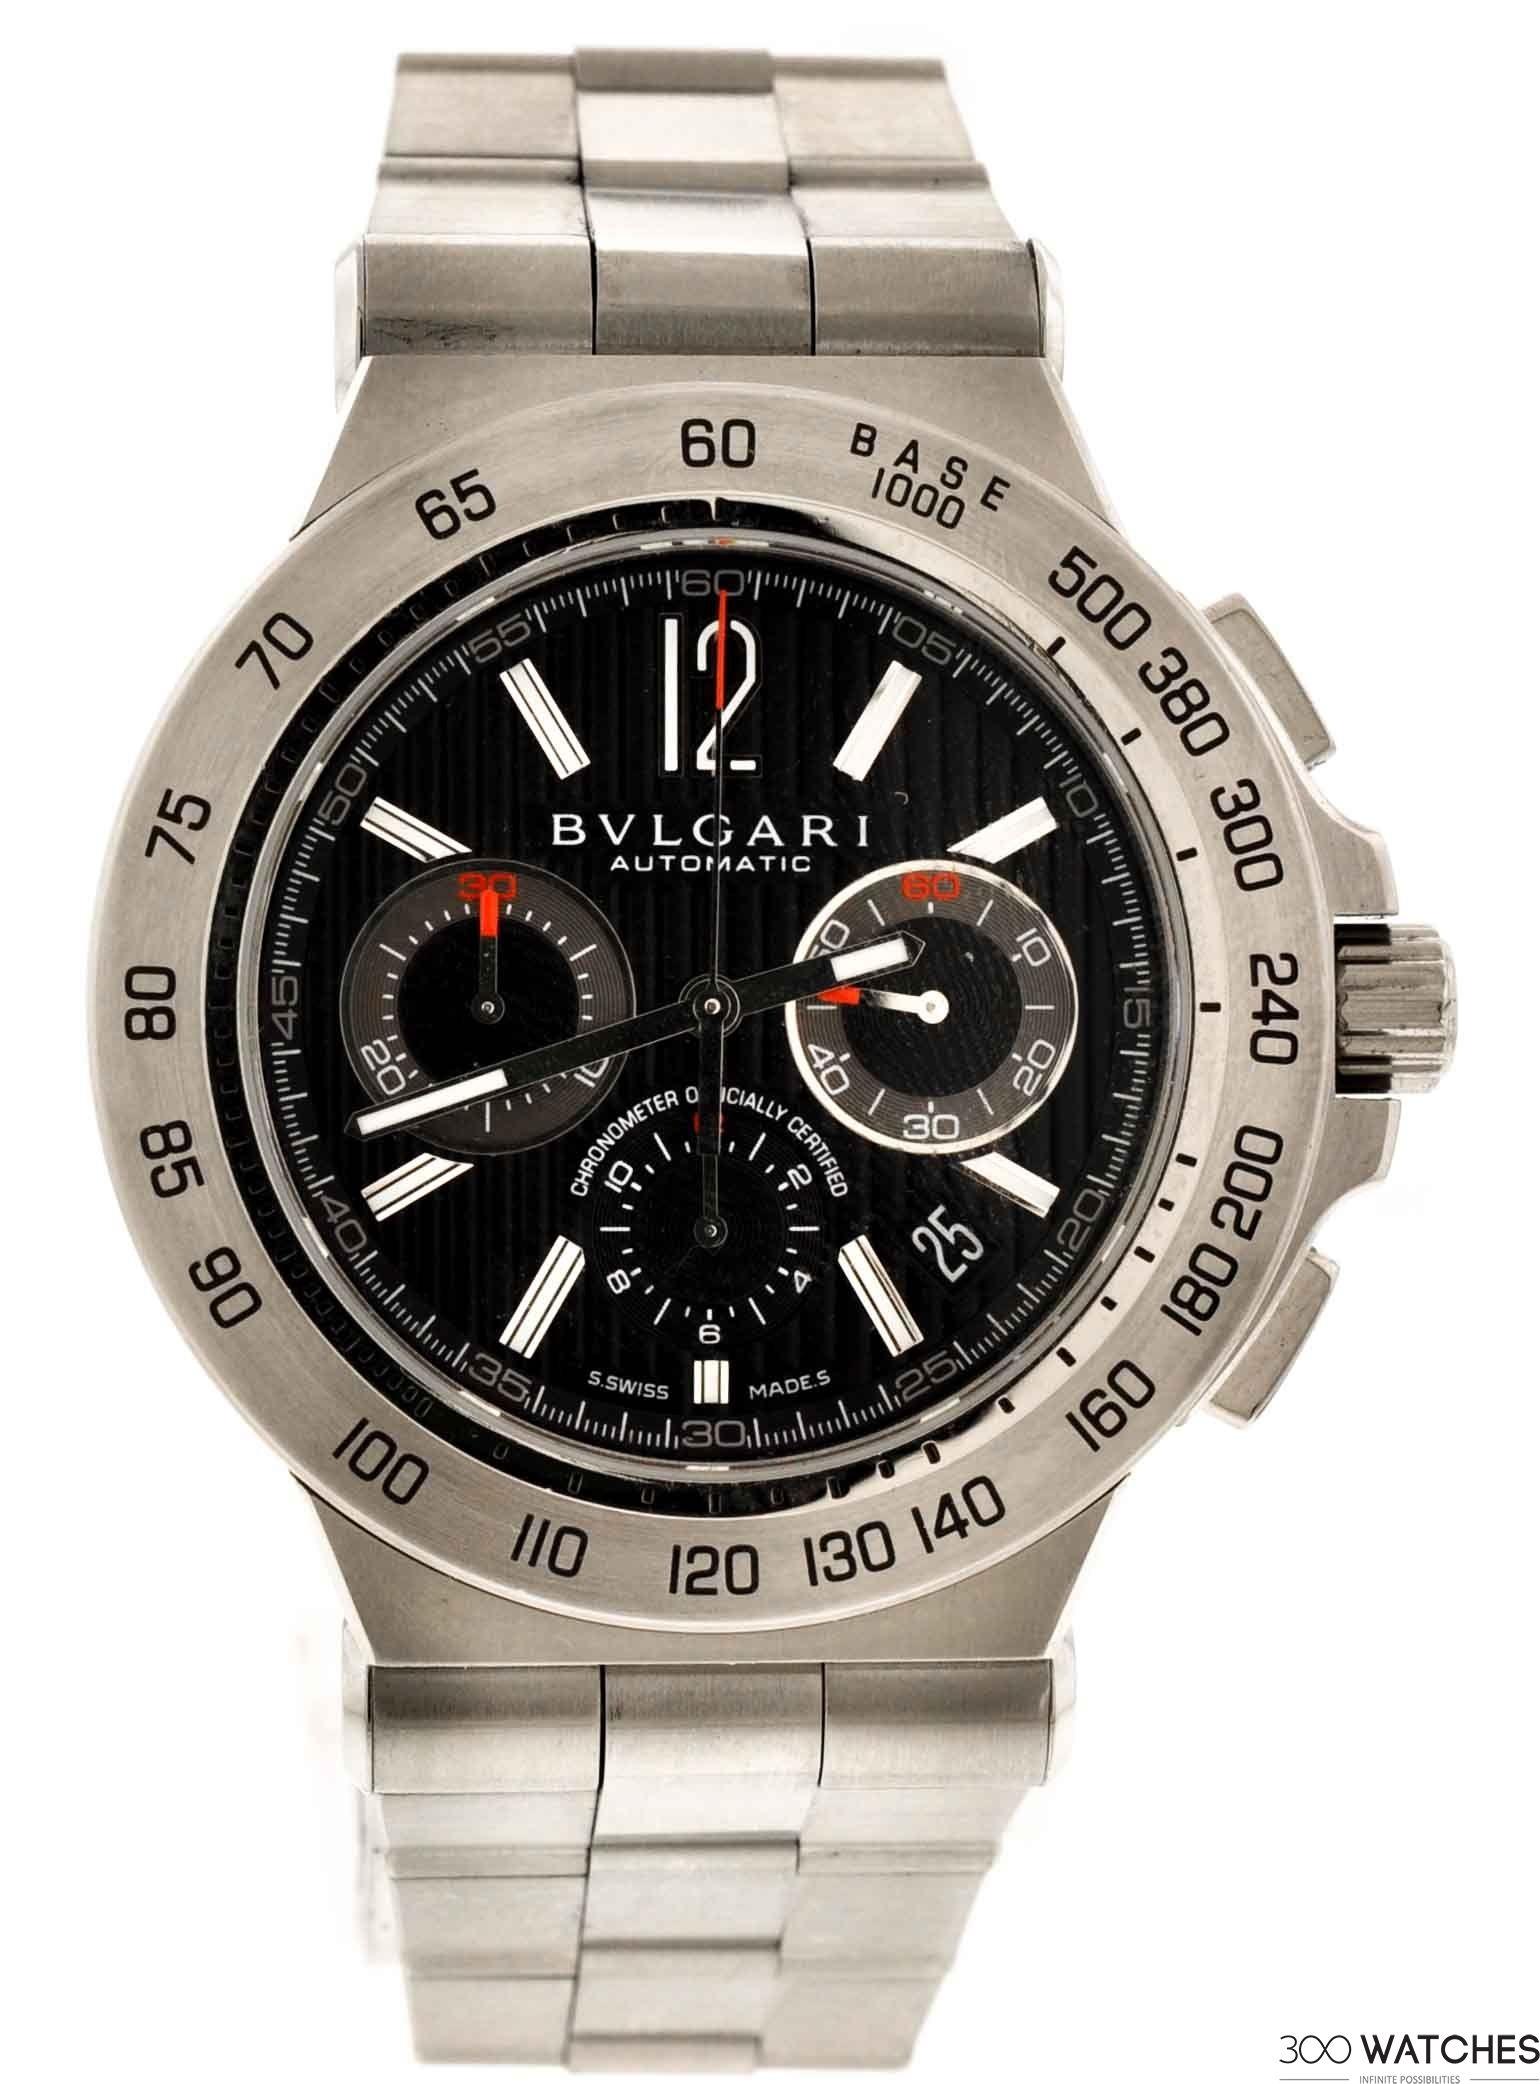 557f02c9755 Bvlgari Diagono DP42SCH Pro Terra Automatic Chronograph Watch ...